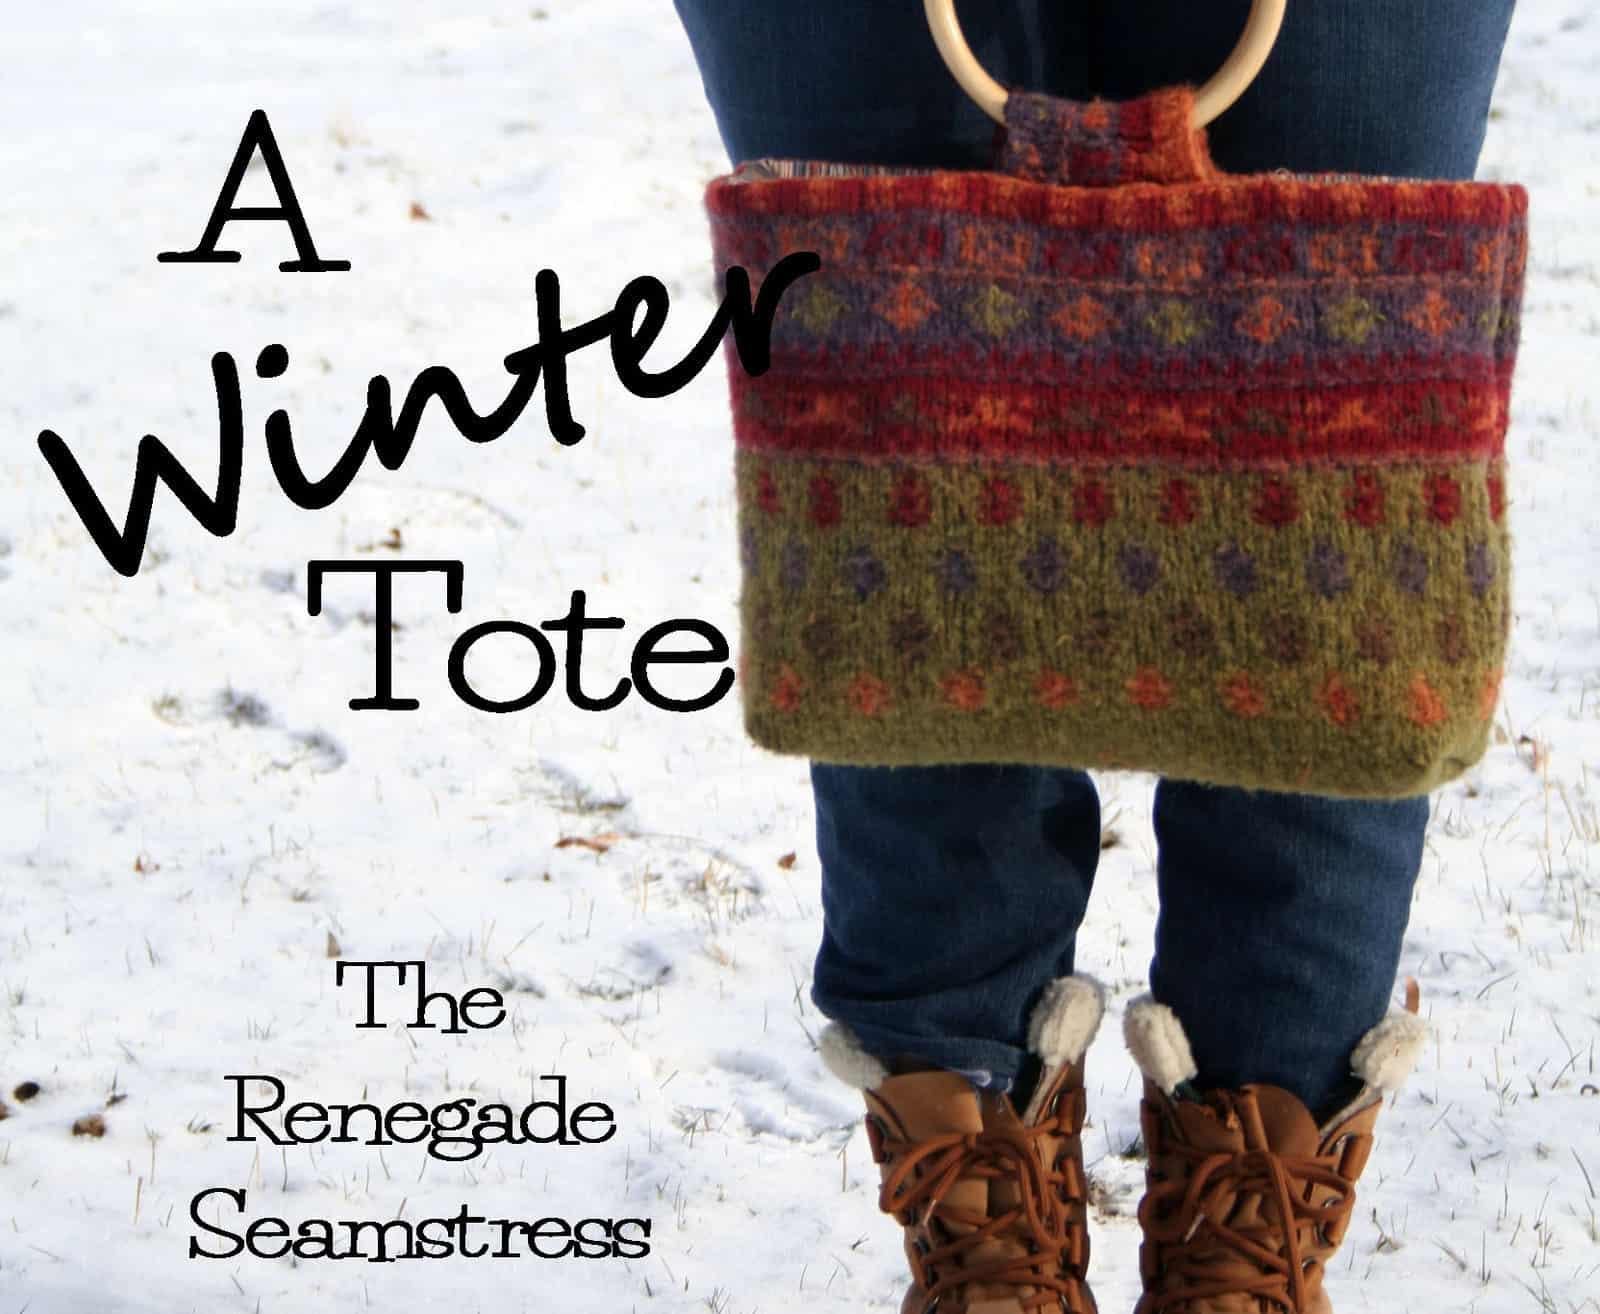 Diy sweater winter tote